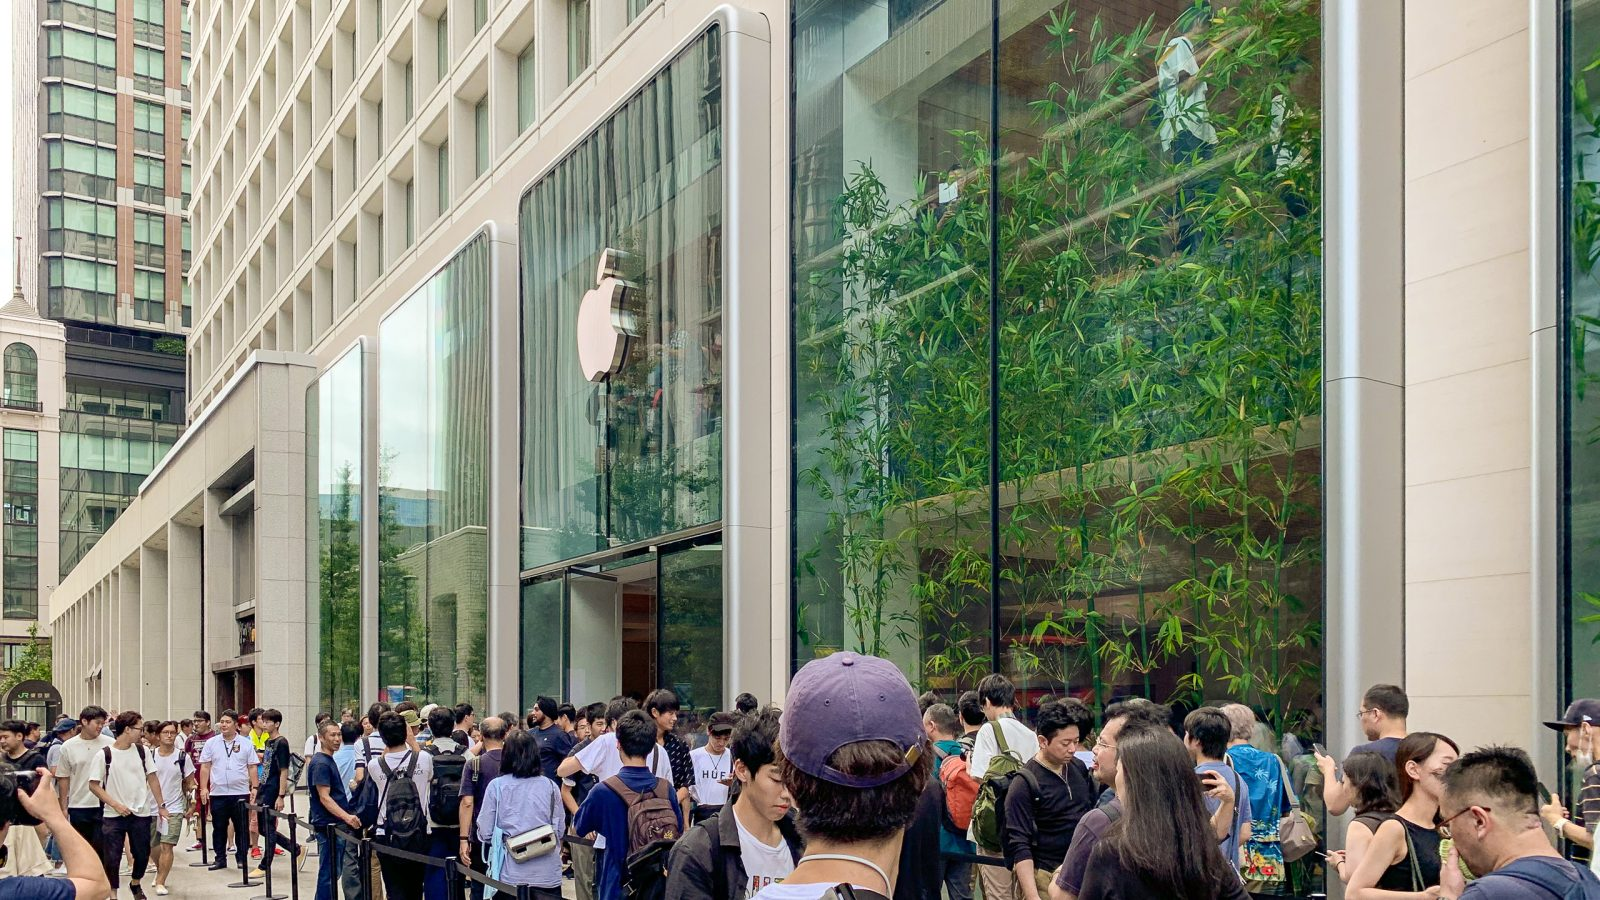 Grand opening: Apple Marunouchi arrives at Tokyo Station